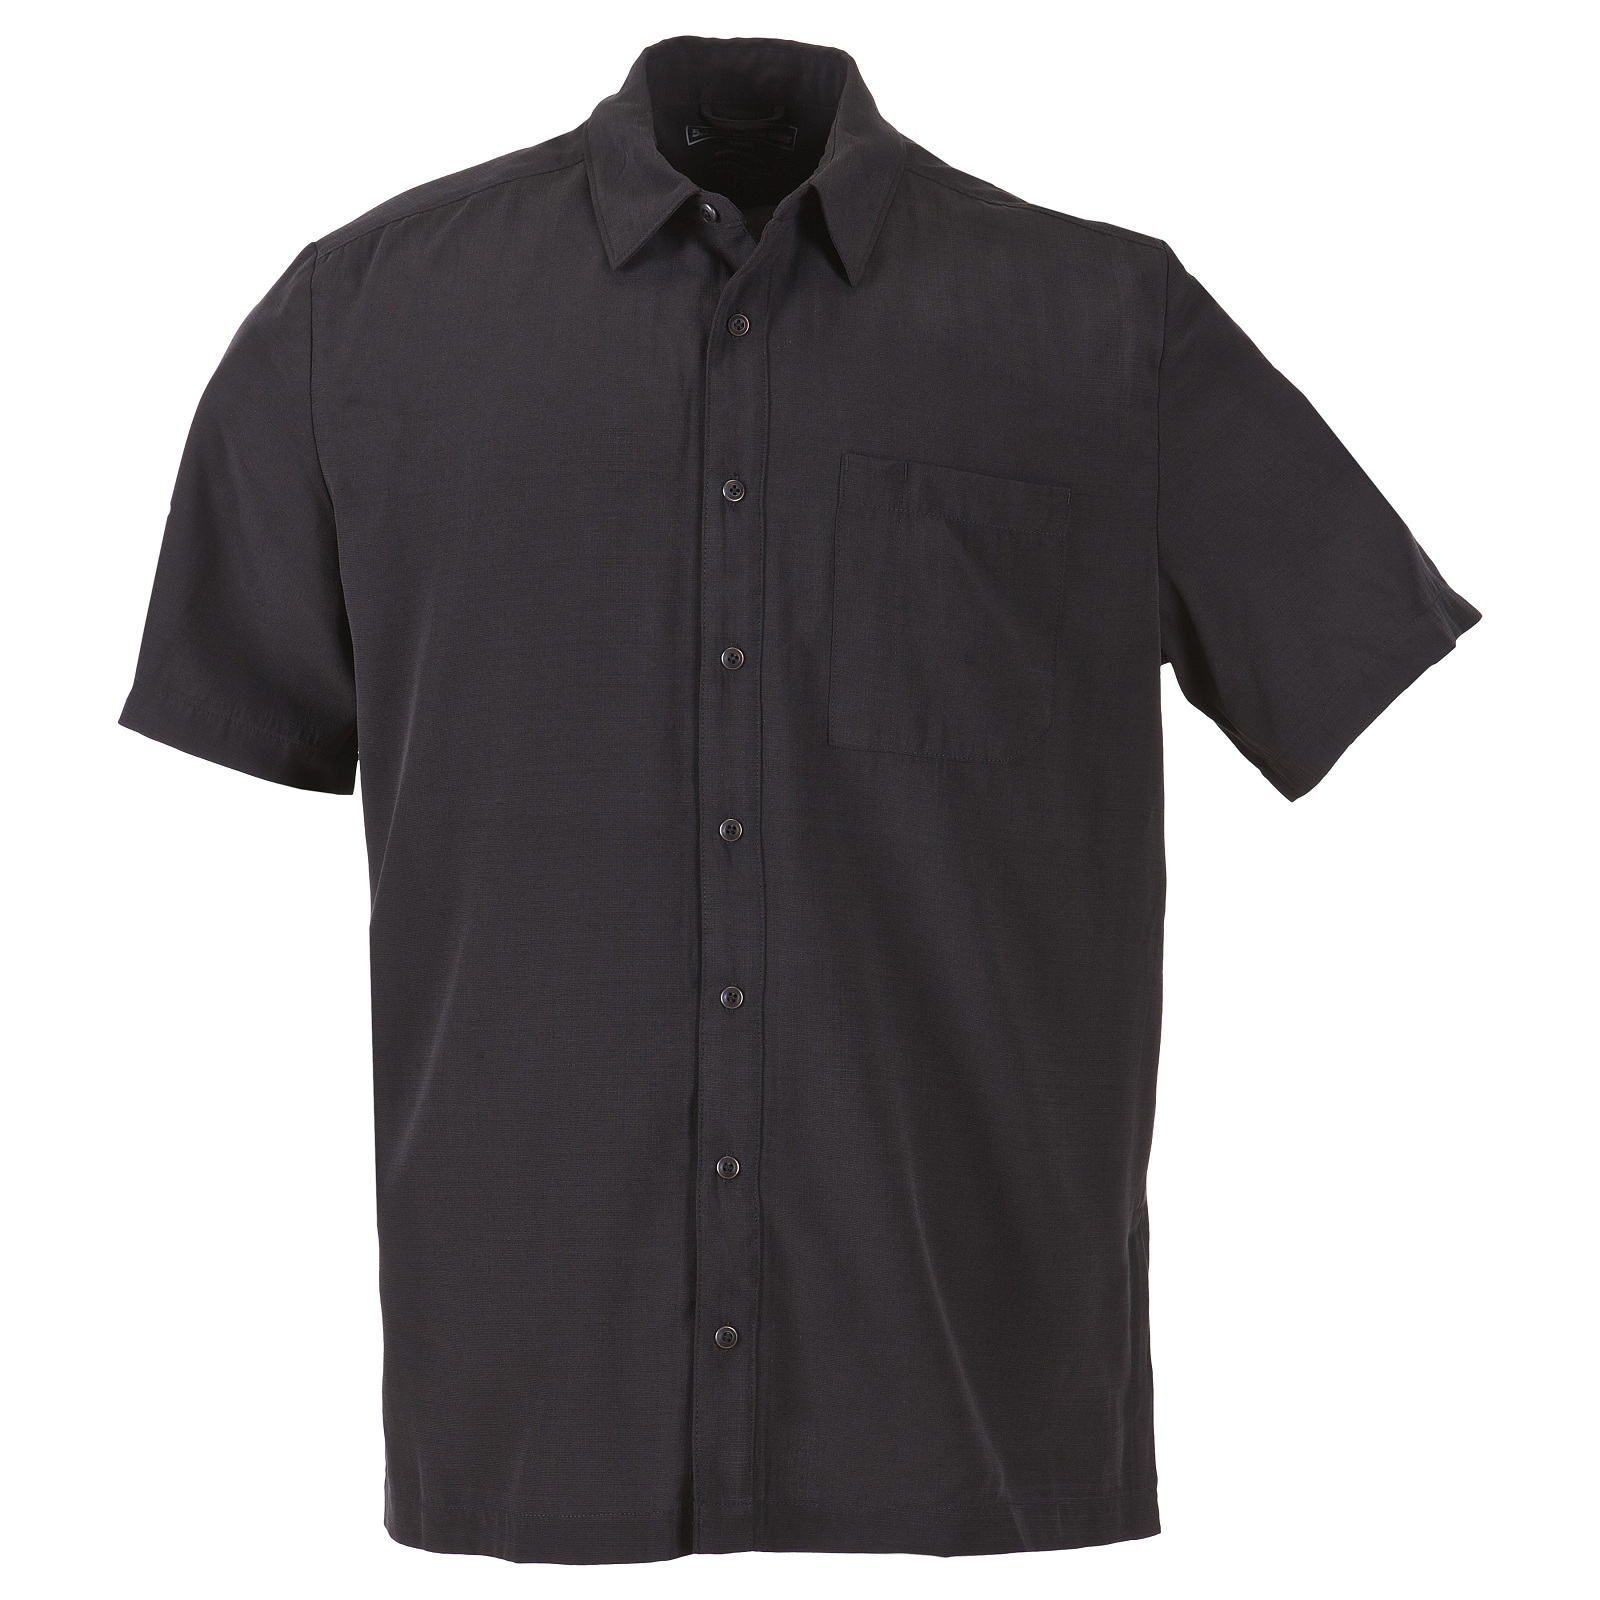 5.11 Tactical Covert Button-Up Black Short Sleeve Shirt Select - 71199